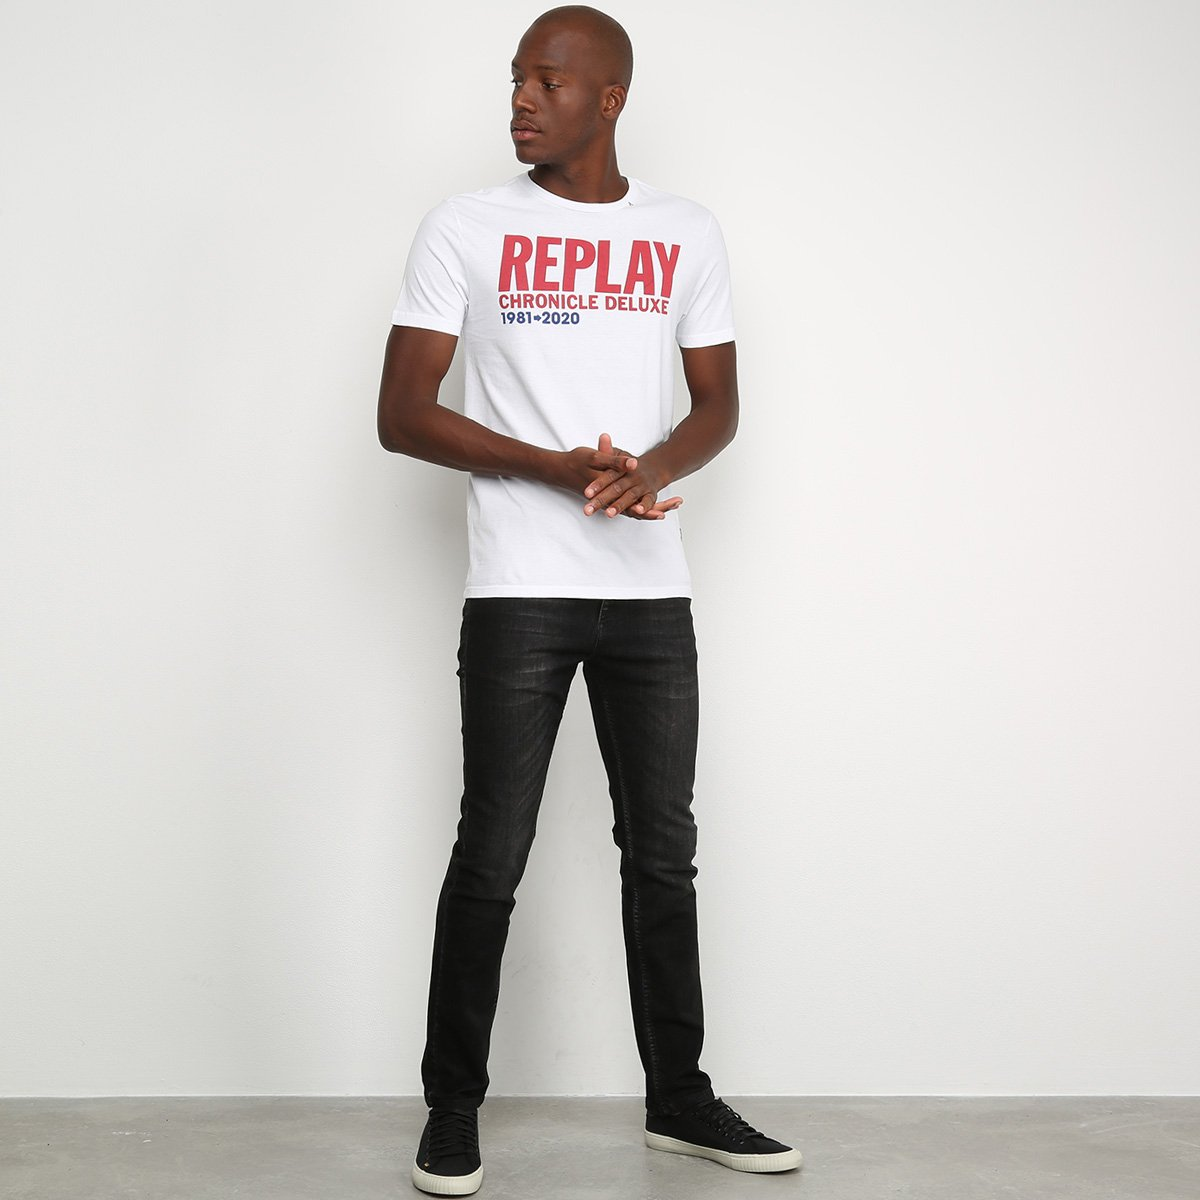 Camiseta Replay Chronicle Deluxe Masculina - Branco